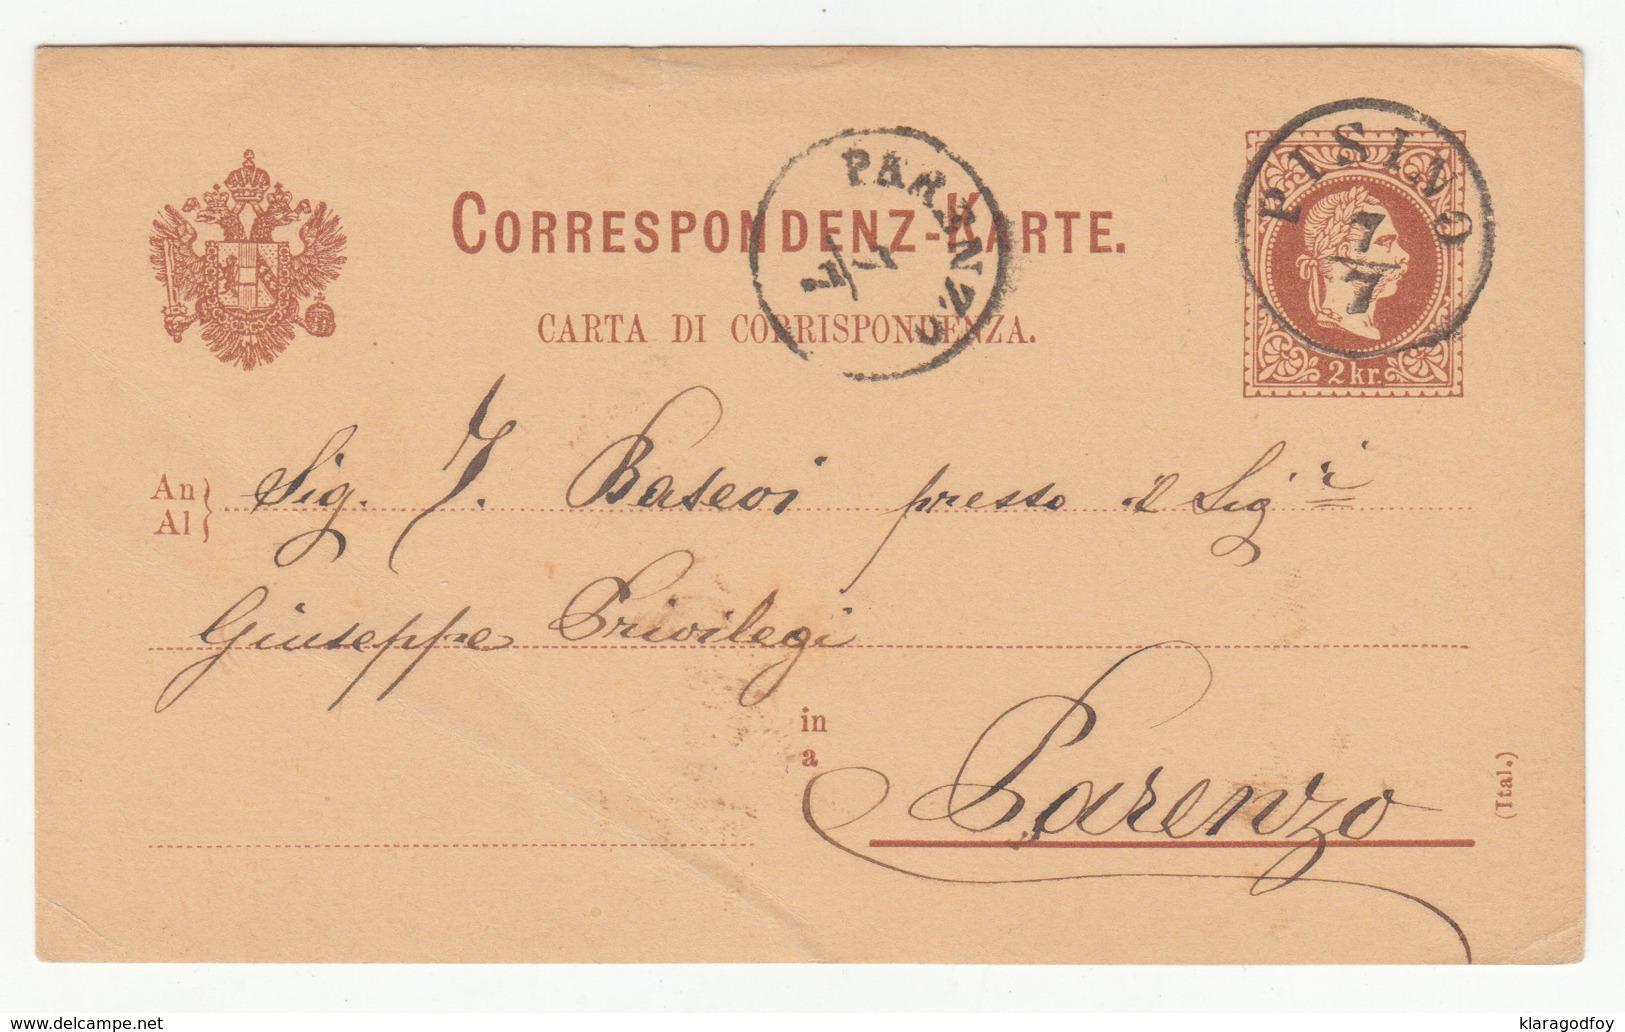 Austria Italian Postal Stationery Postcard Carta Di Corrispond. Travelled 1882 Pisino (Pazin) To Parenzo (Poreč) B190715 - Croatia